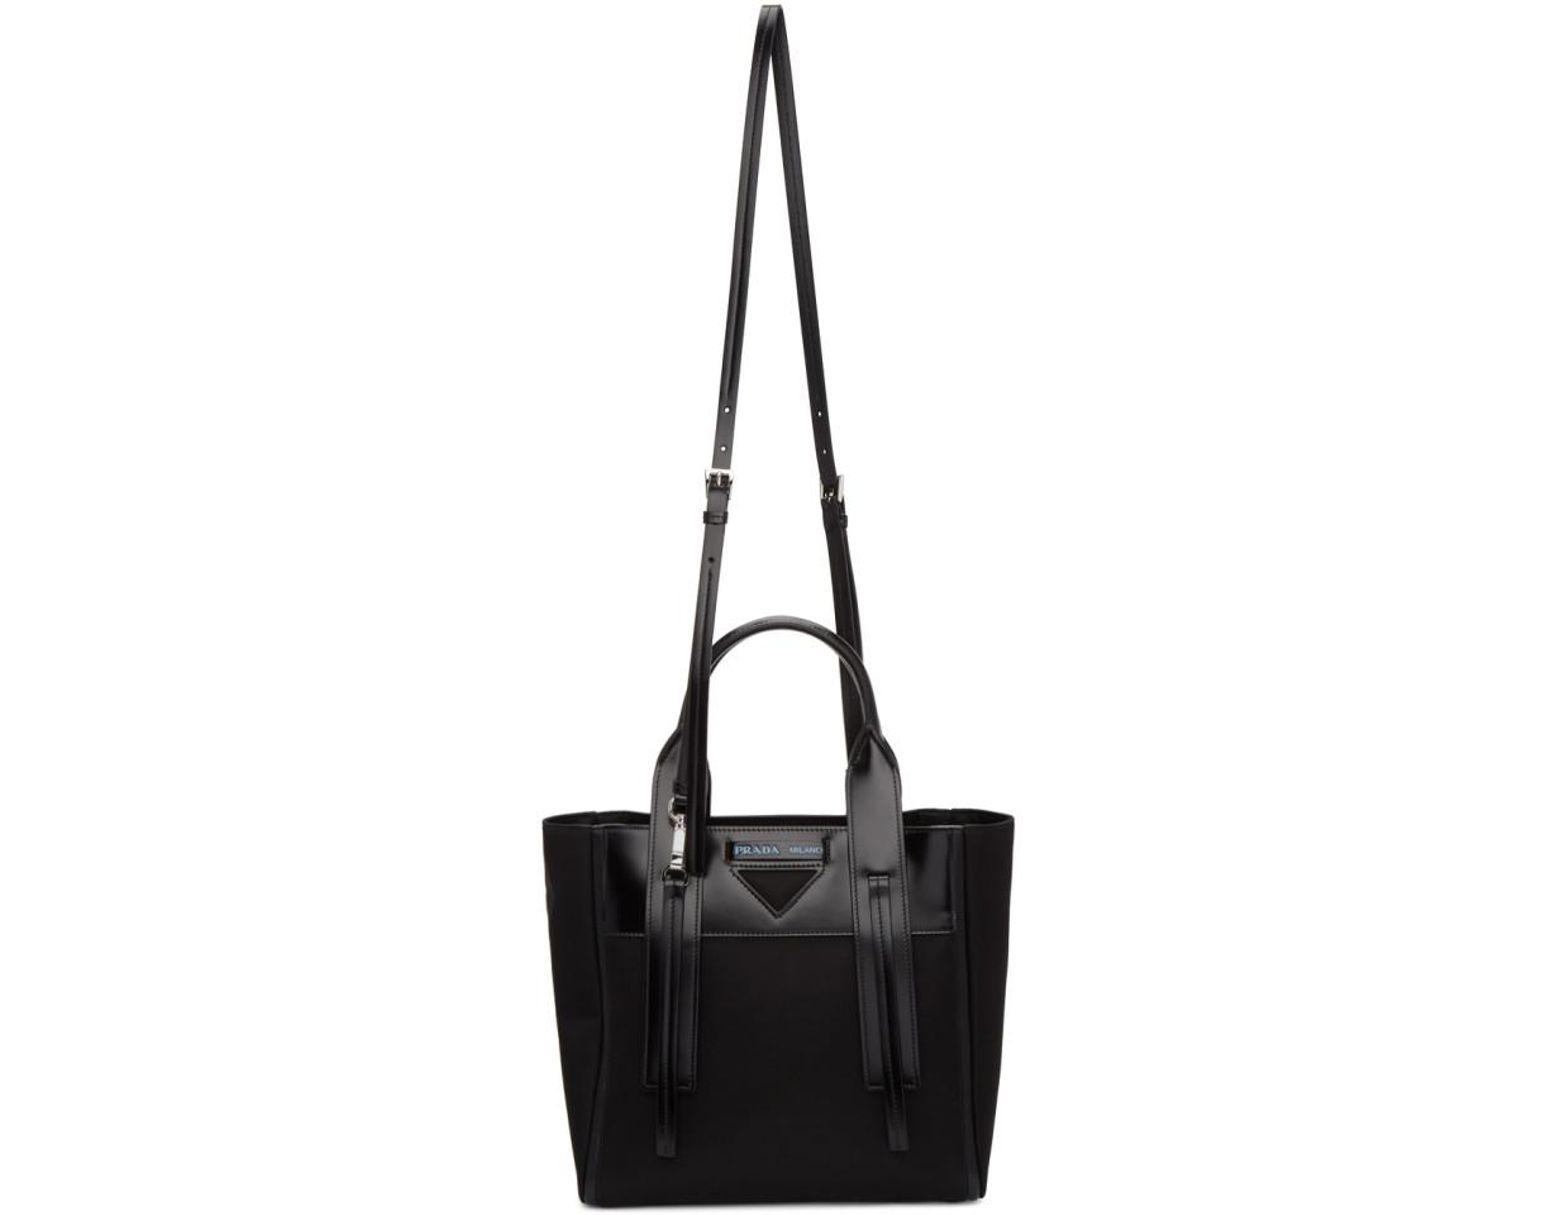 79330a173151 Prada Black Ouverture Tote Bag in Black - Lyst